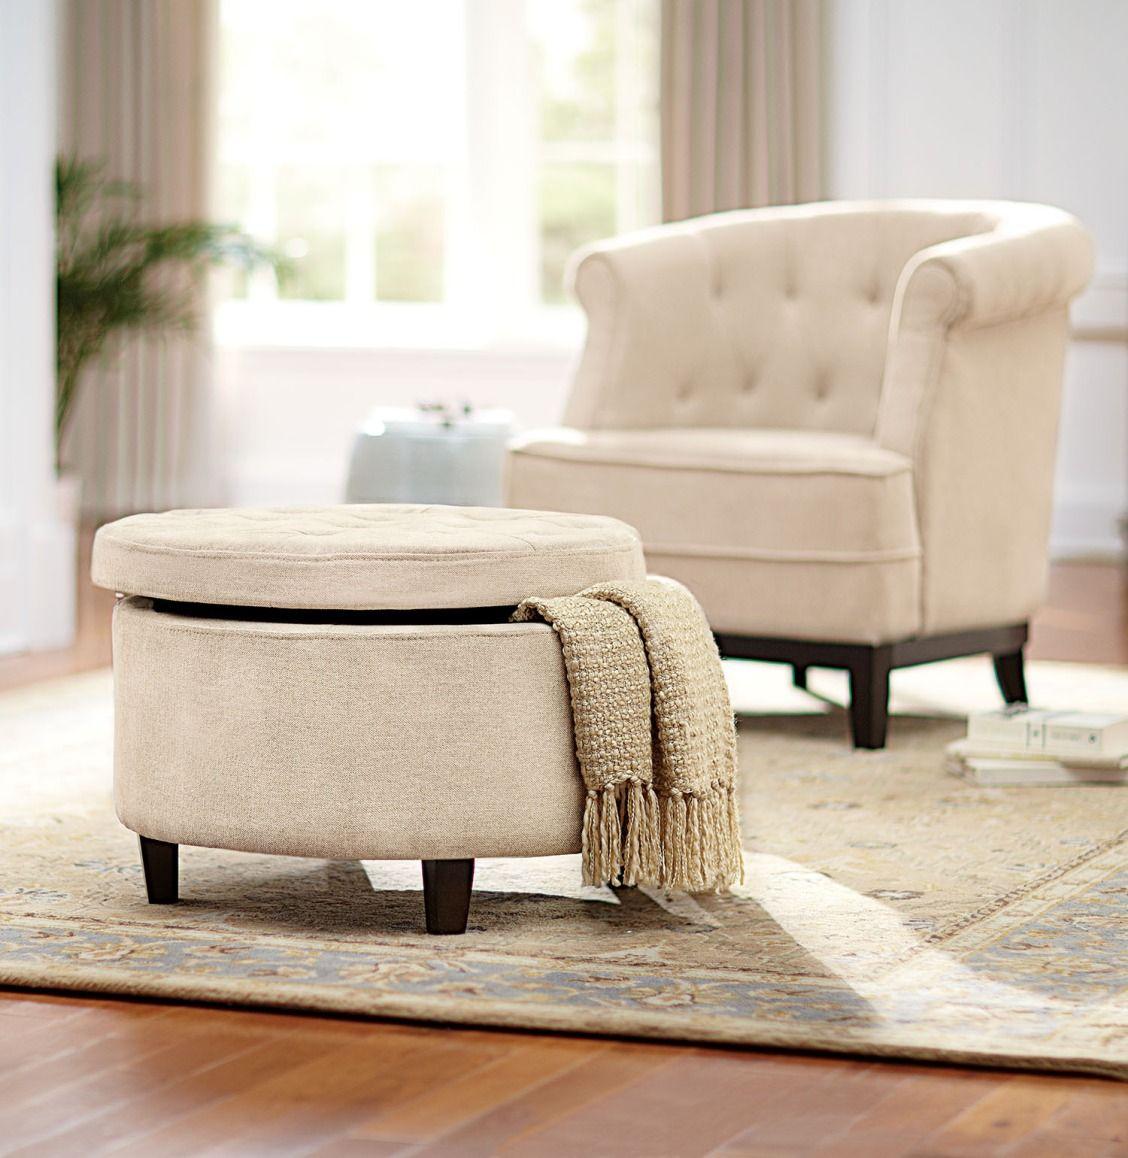 Home Decorators Collection Emma Textured Natural Storage Ottoman ...